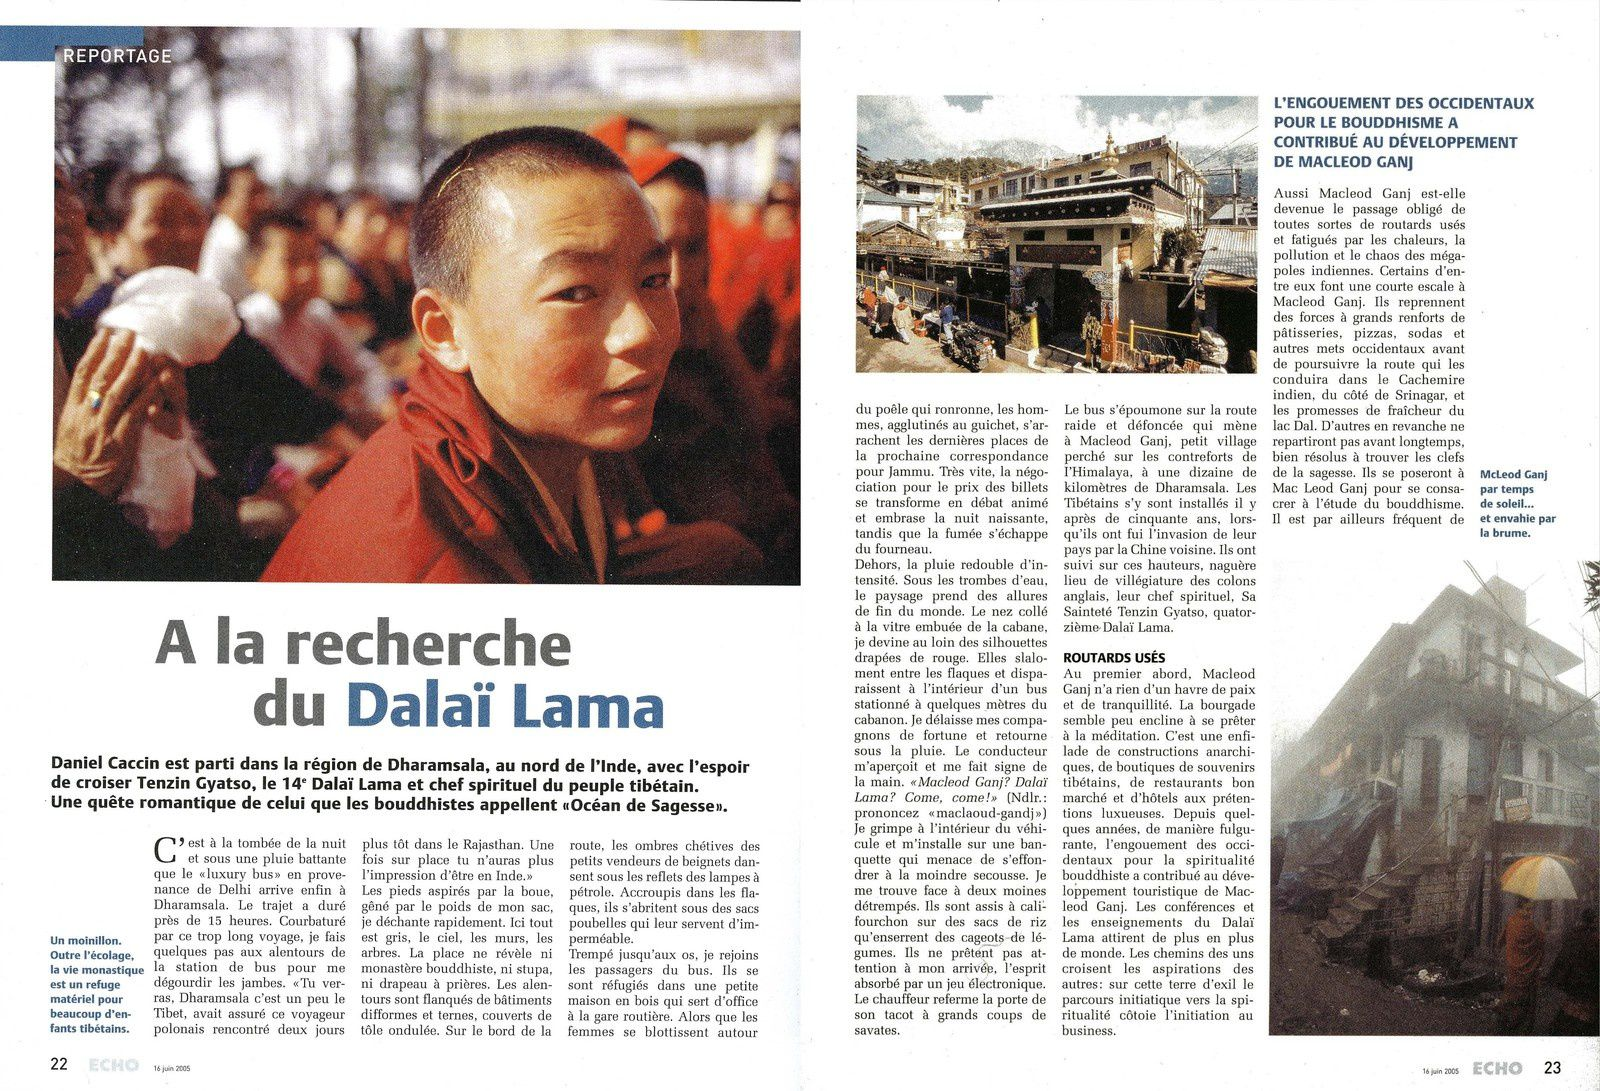 Inde - A la recherche du Dalaï Lama